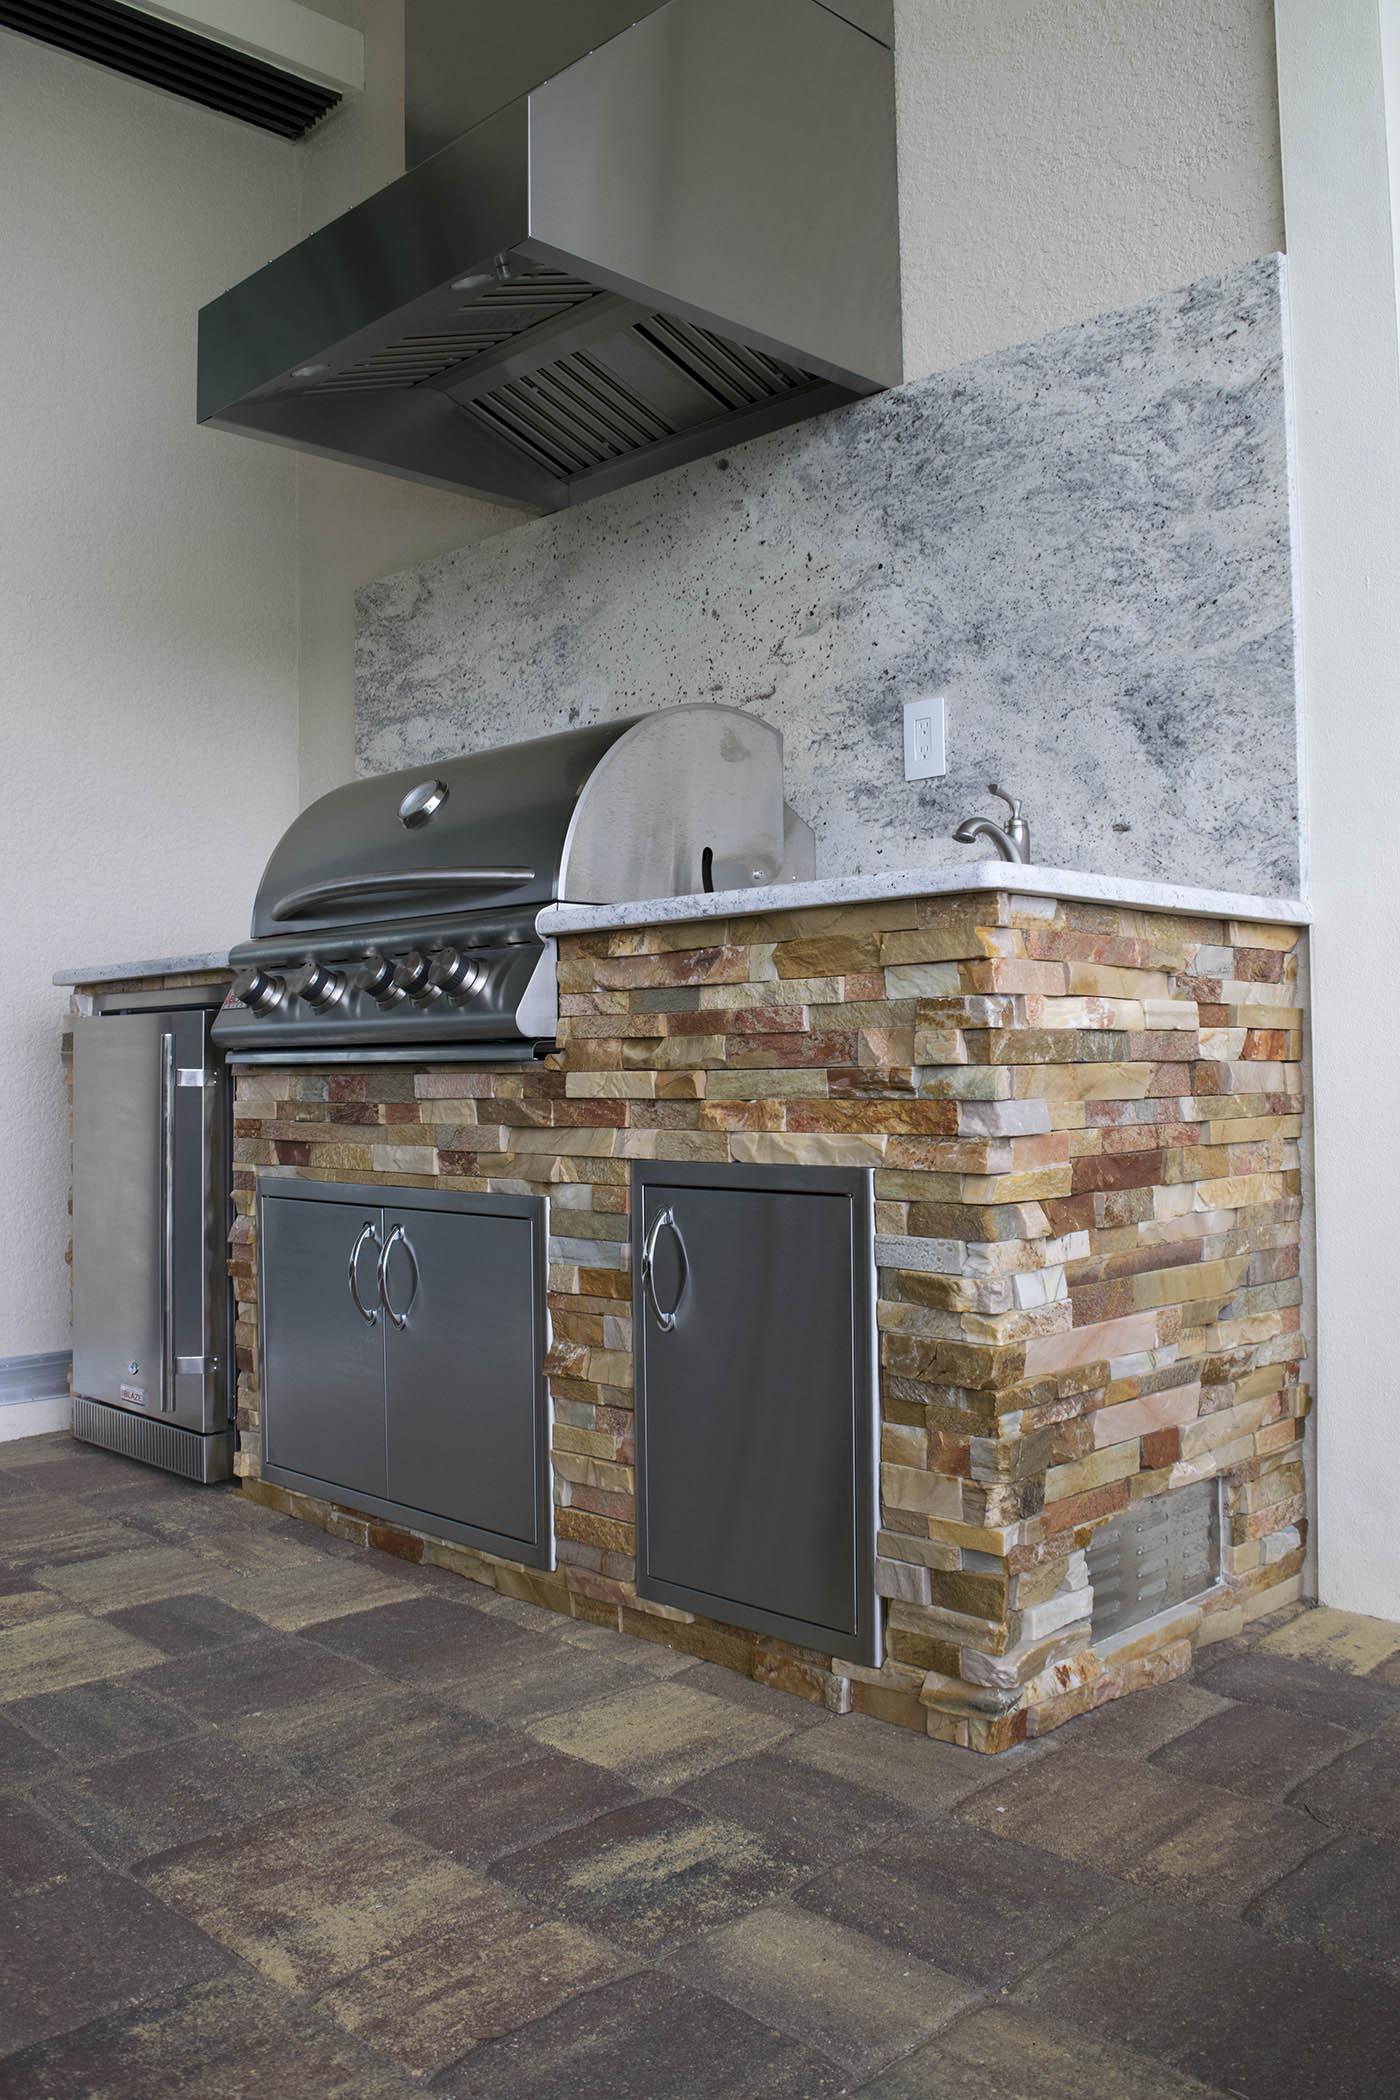 Southwest Florida Outdoor Kitchen Manufacturers - Elegant Outdoor ...